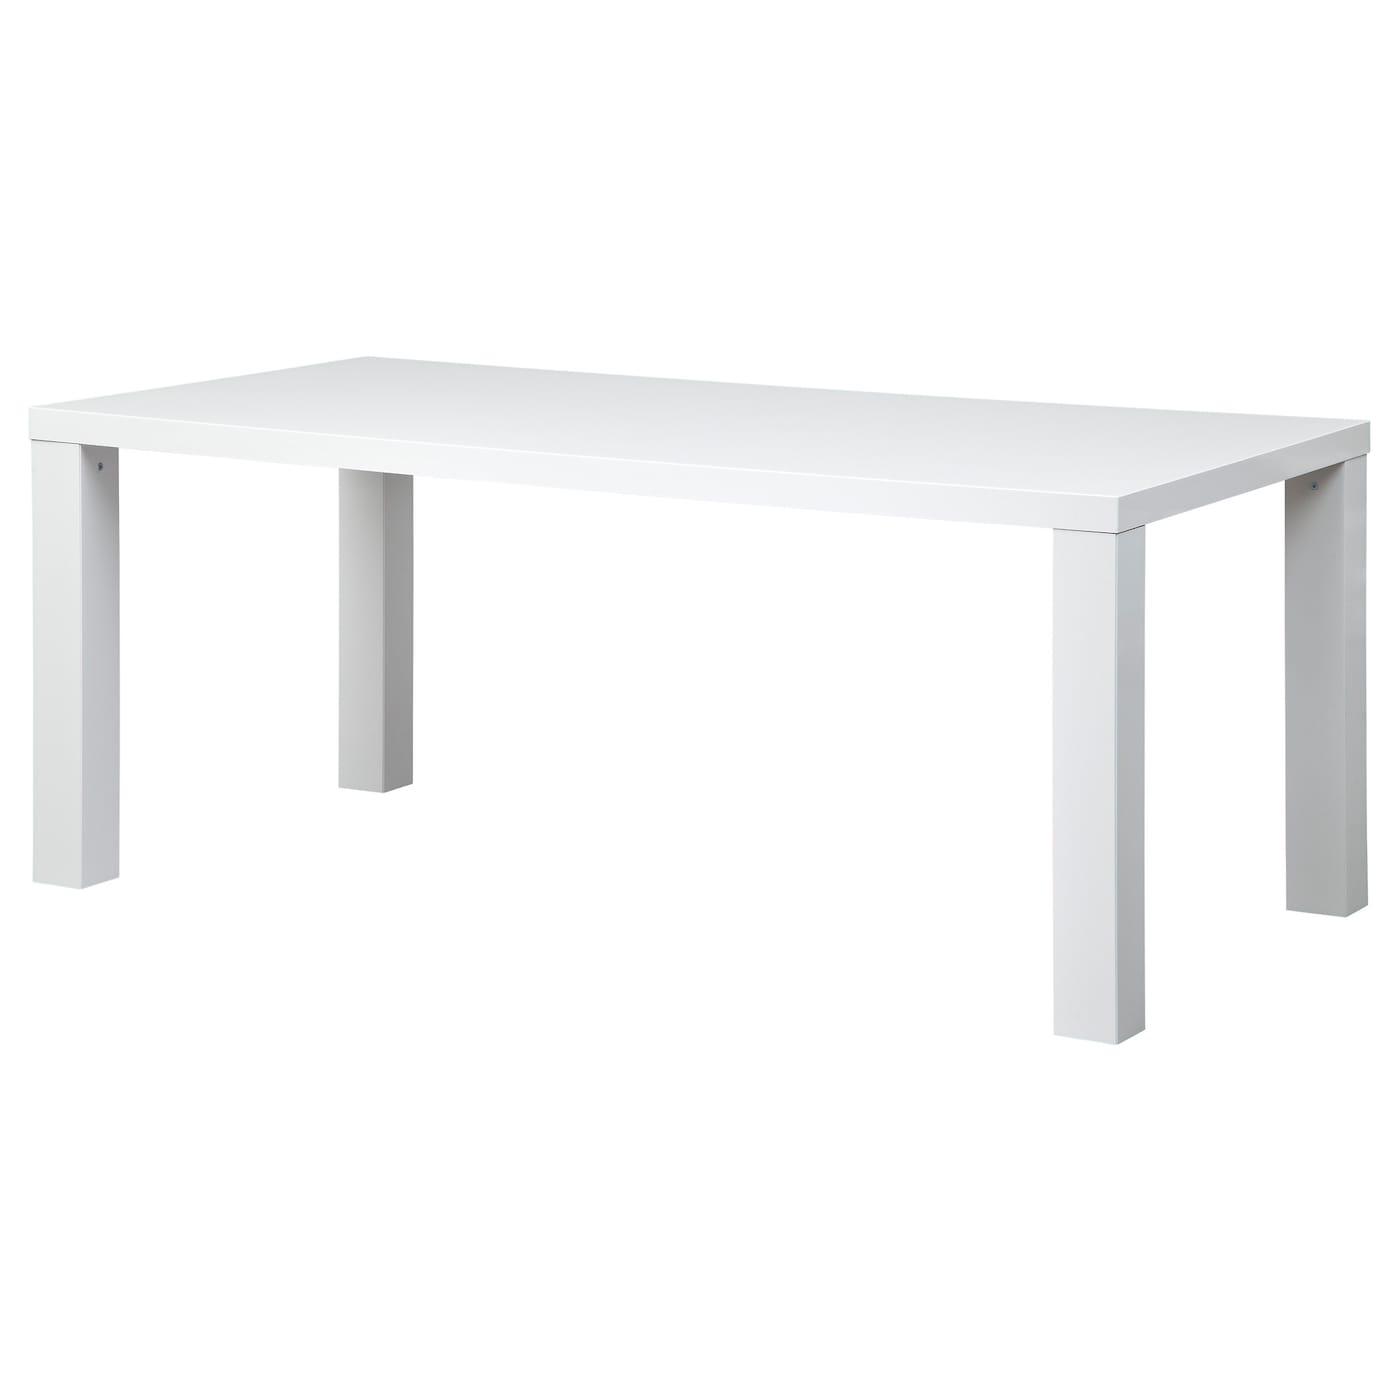 Salontafel En Eettafel Wit Hoogglans.Toresund Tafel Wit Hoogglans Ikea